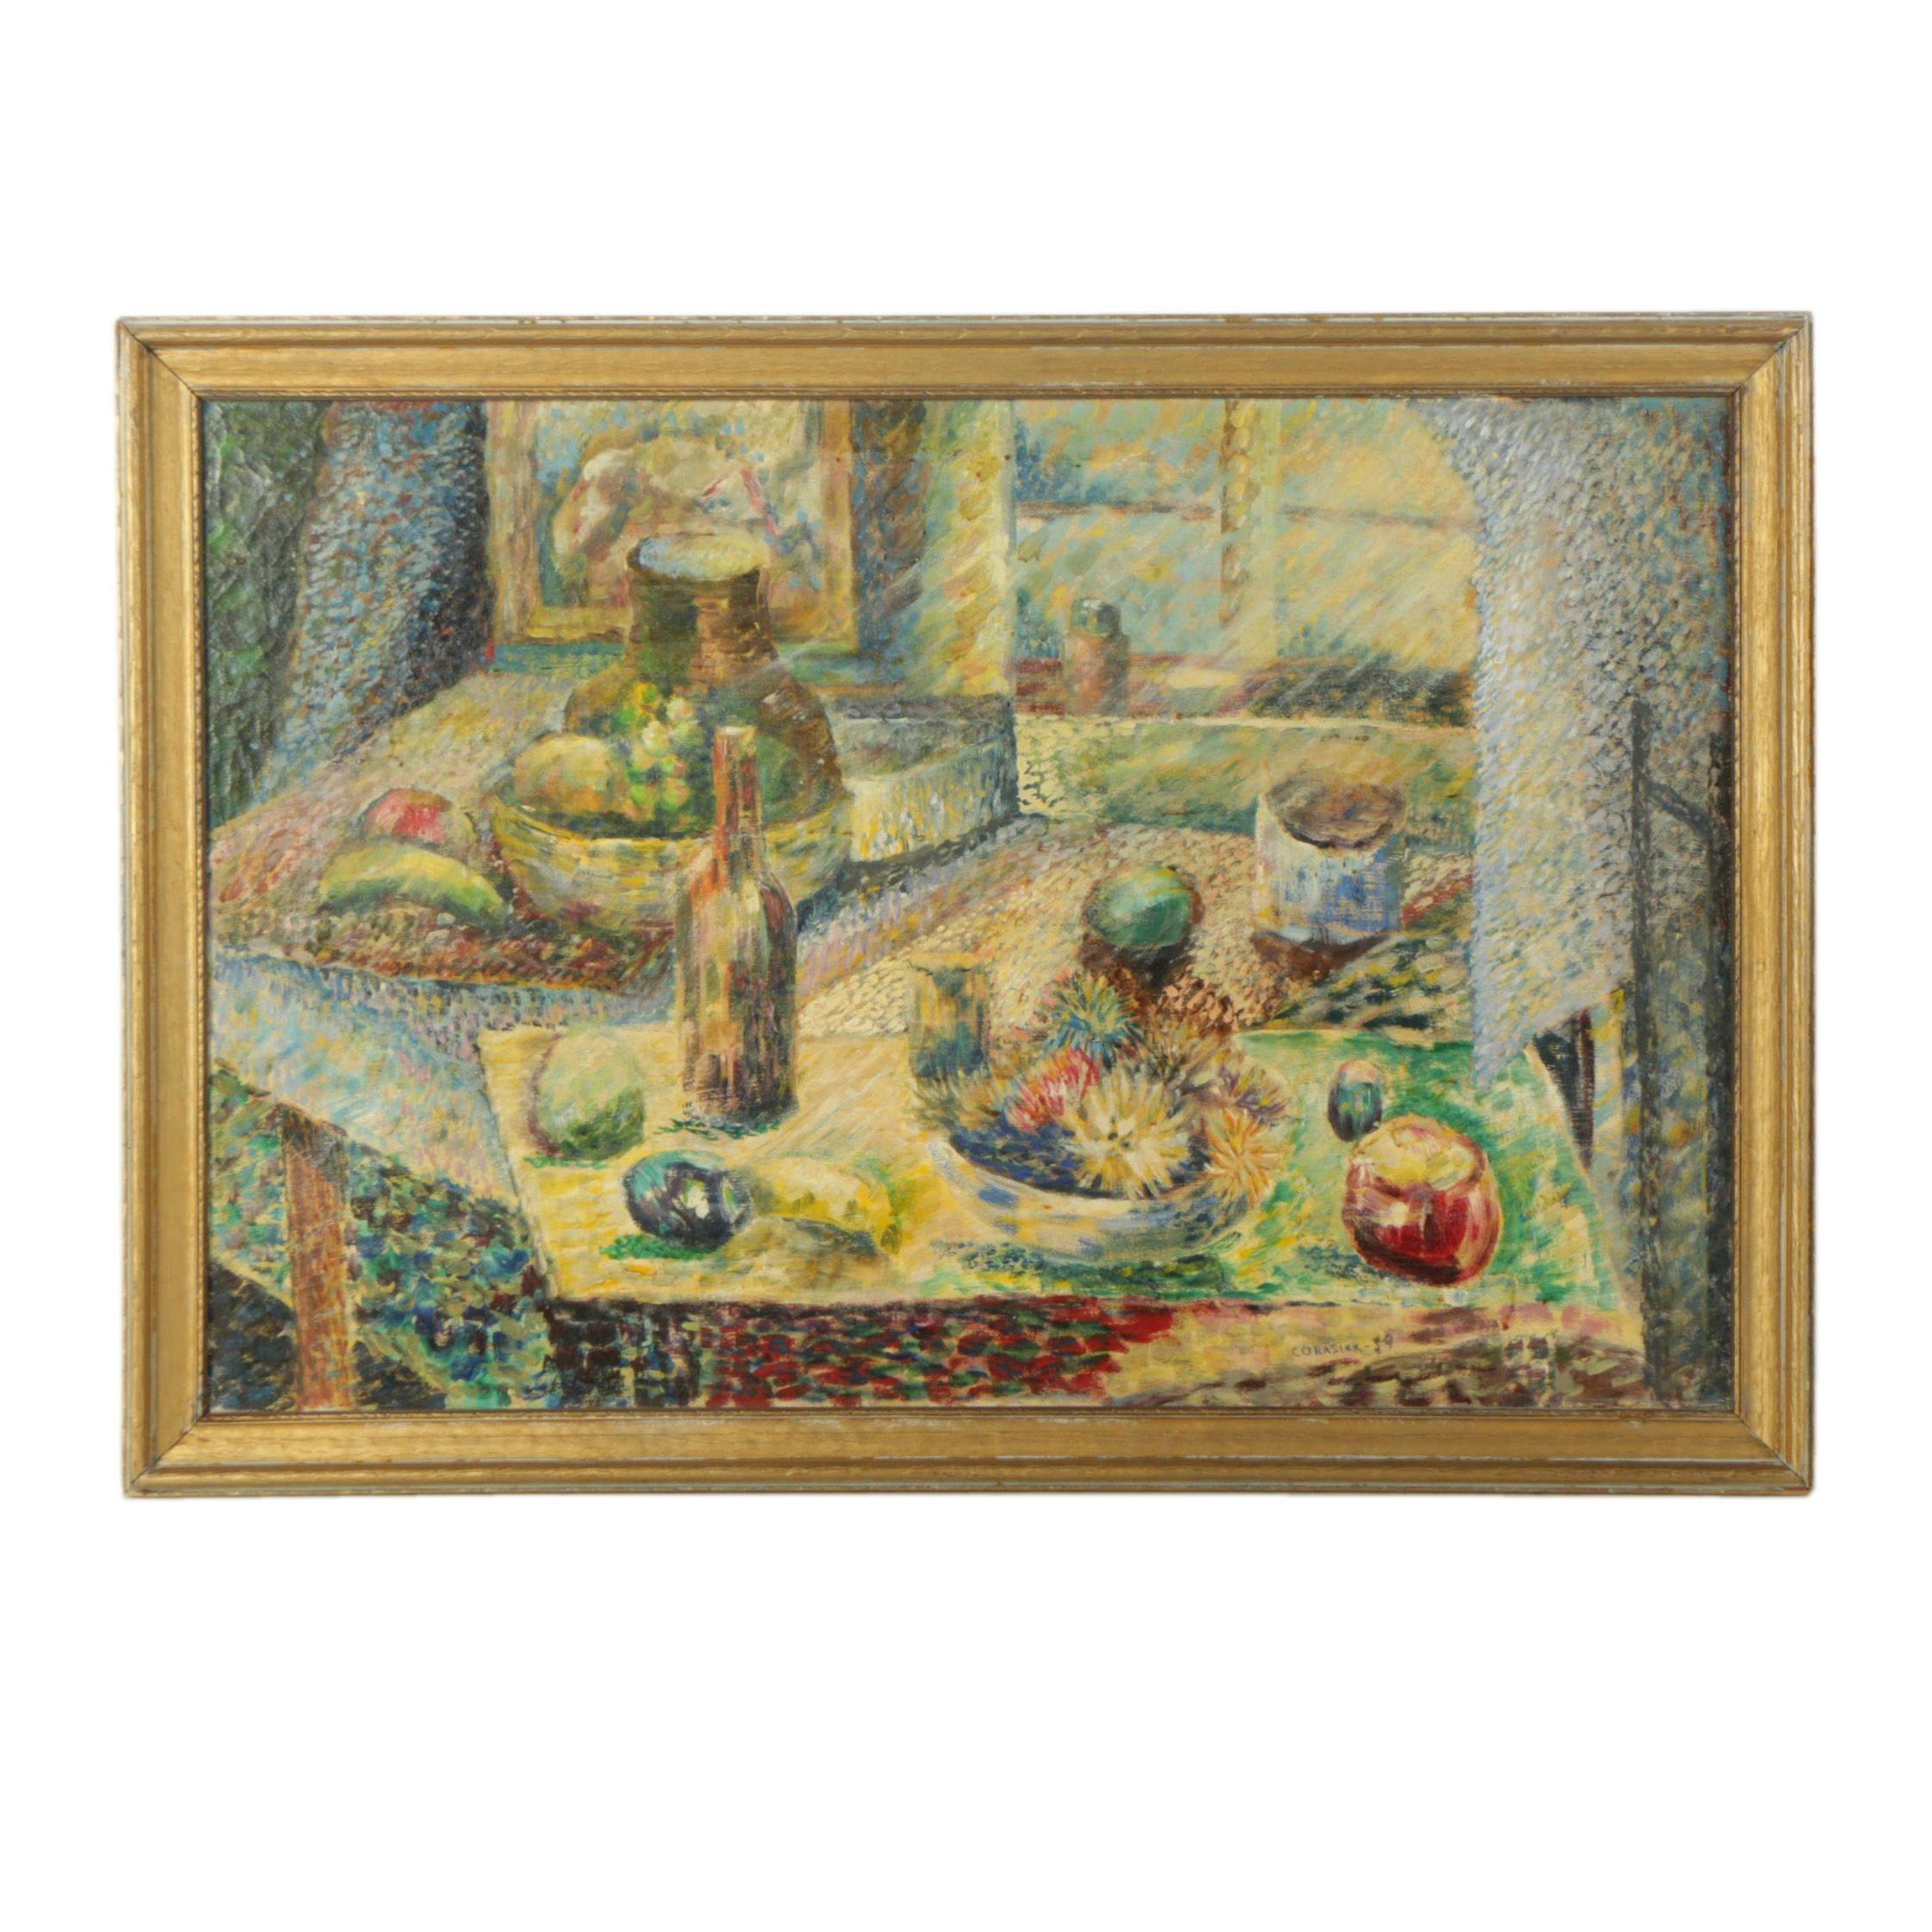 William Corasick Oil Painting on Canvas Still Life